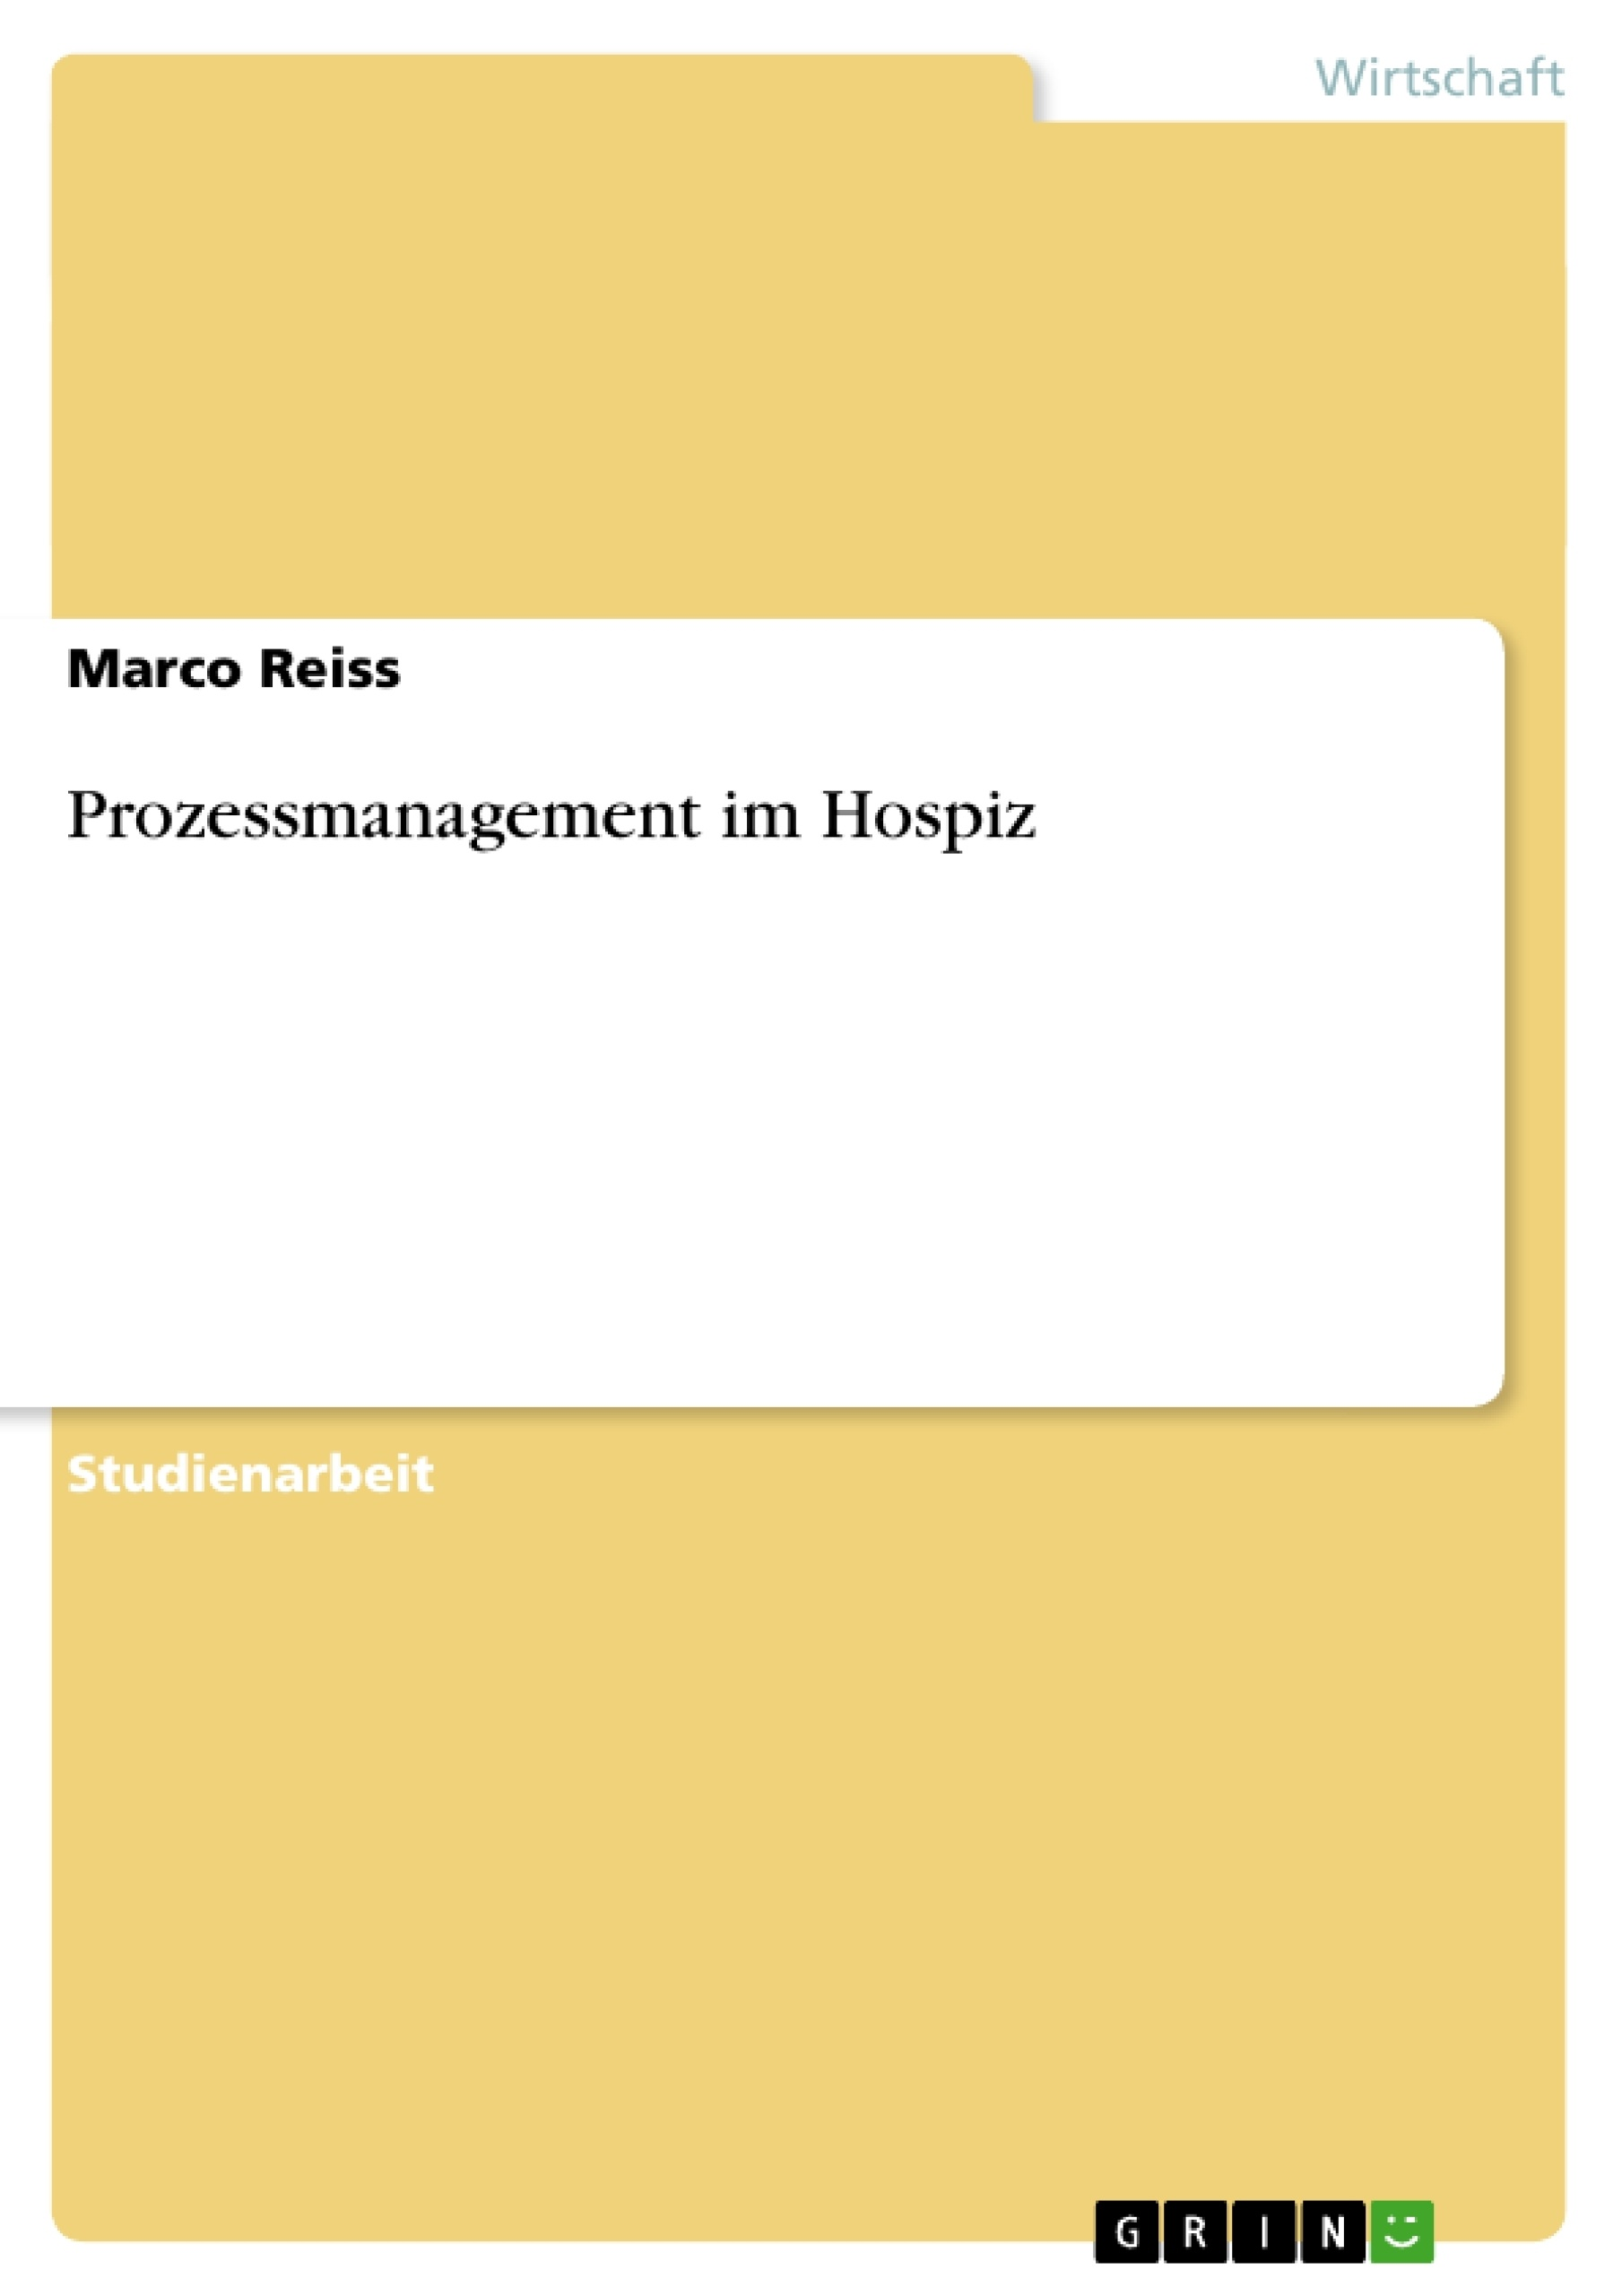 Titel: Prozessmanagement im Hospiz